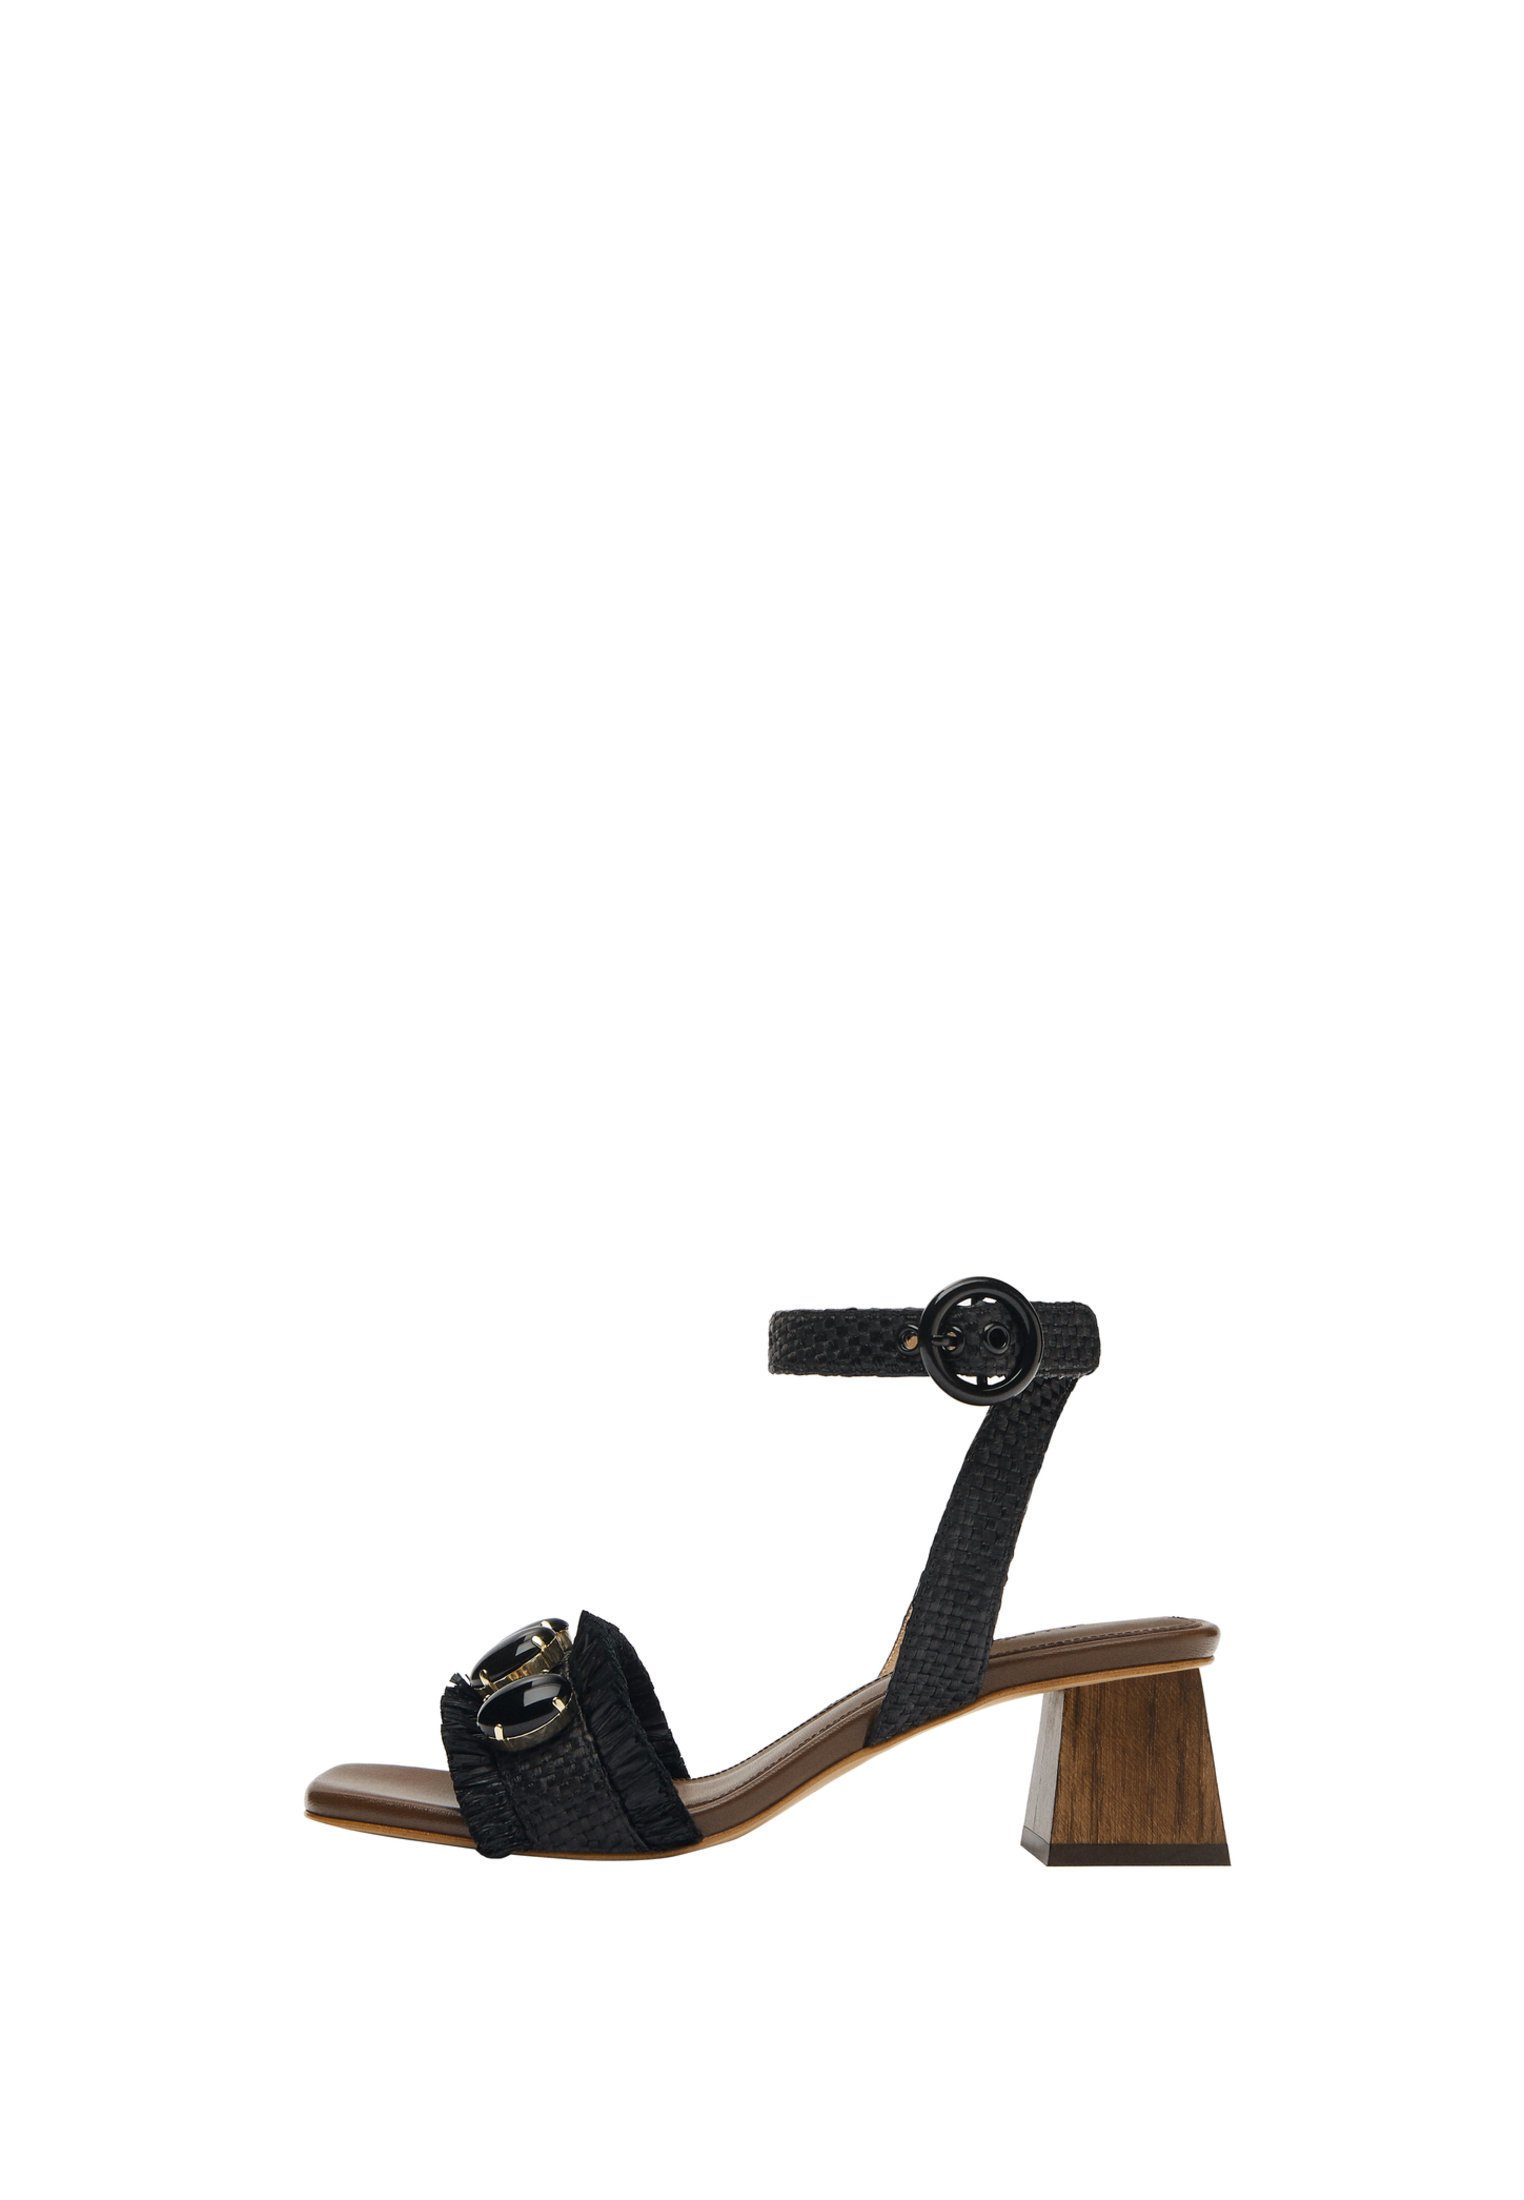 Sandaler med skaft | Köp sandaler online på Zalando